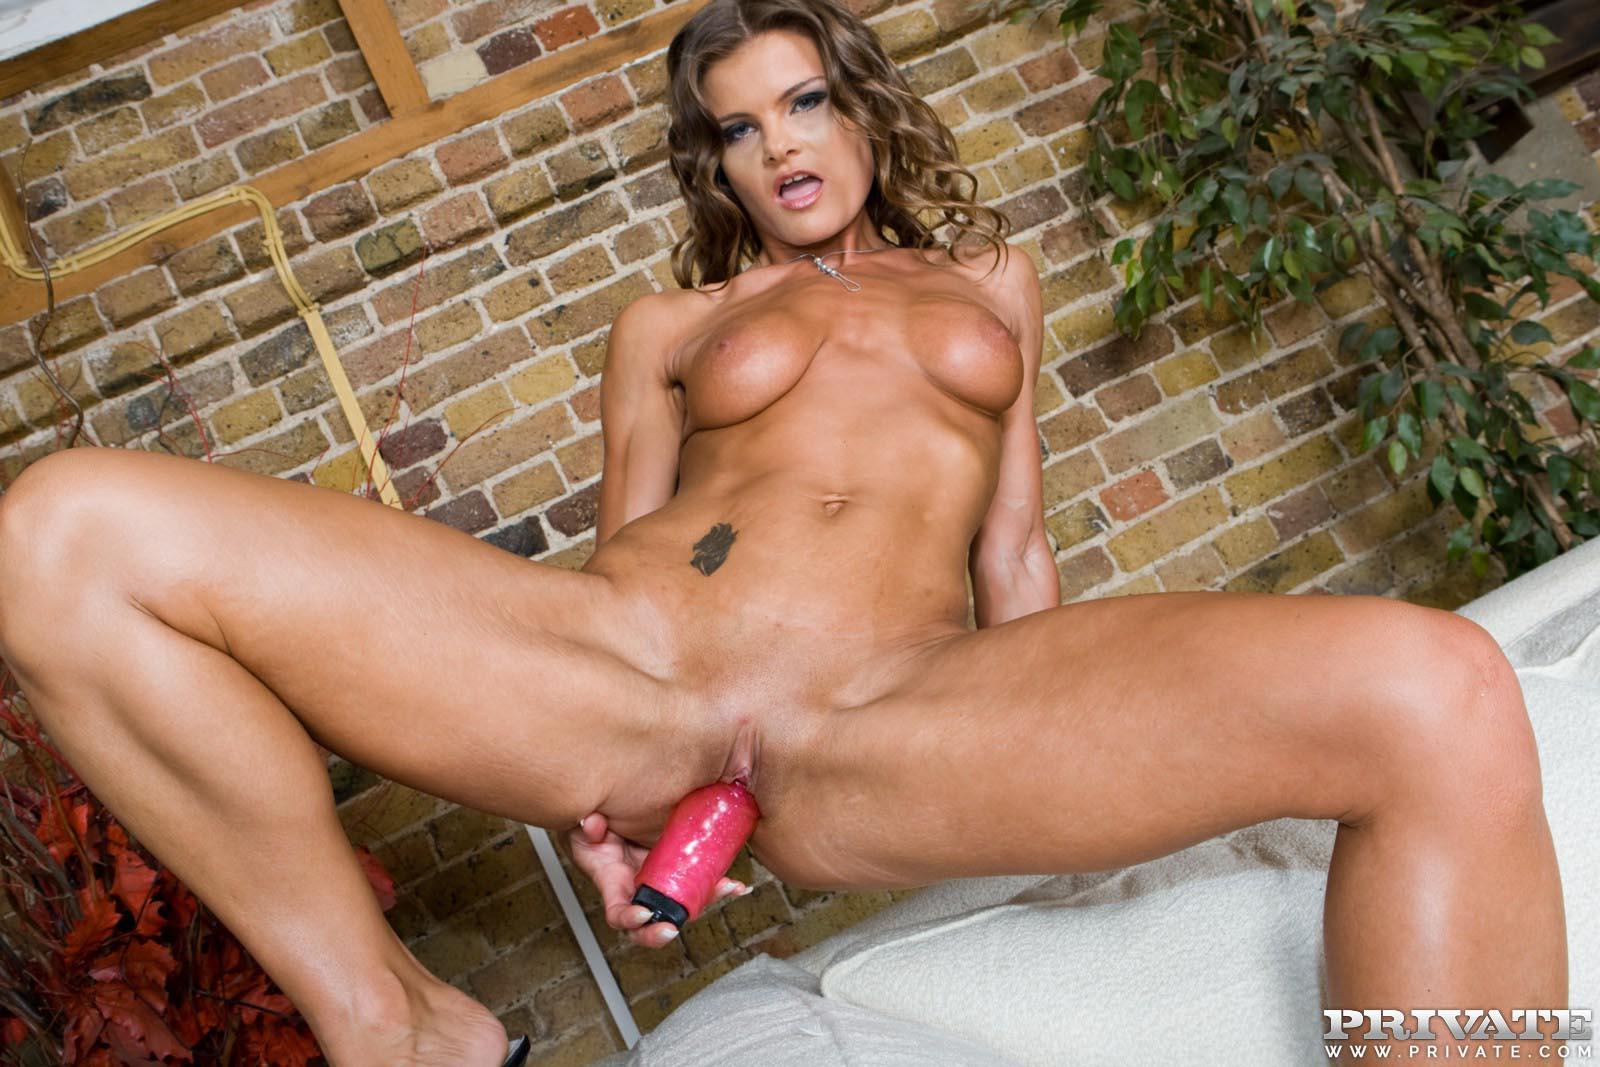 Female orgasm sex photo featuring karla romano and suzie best